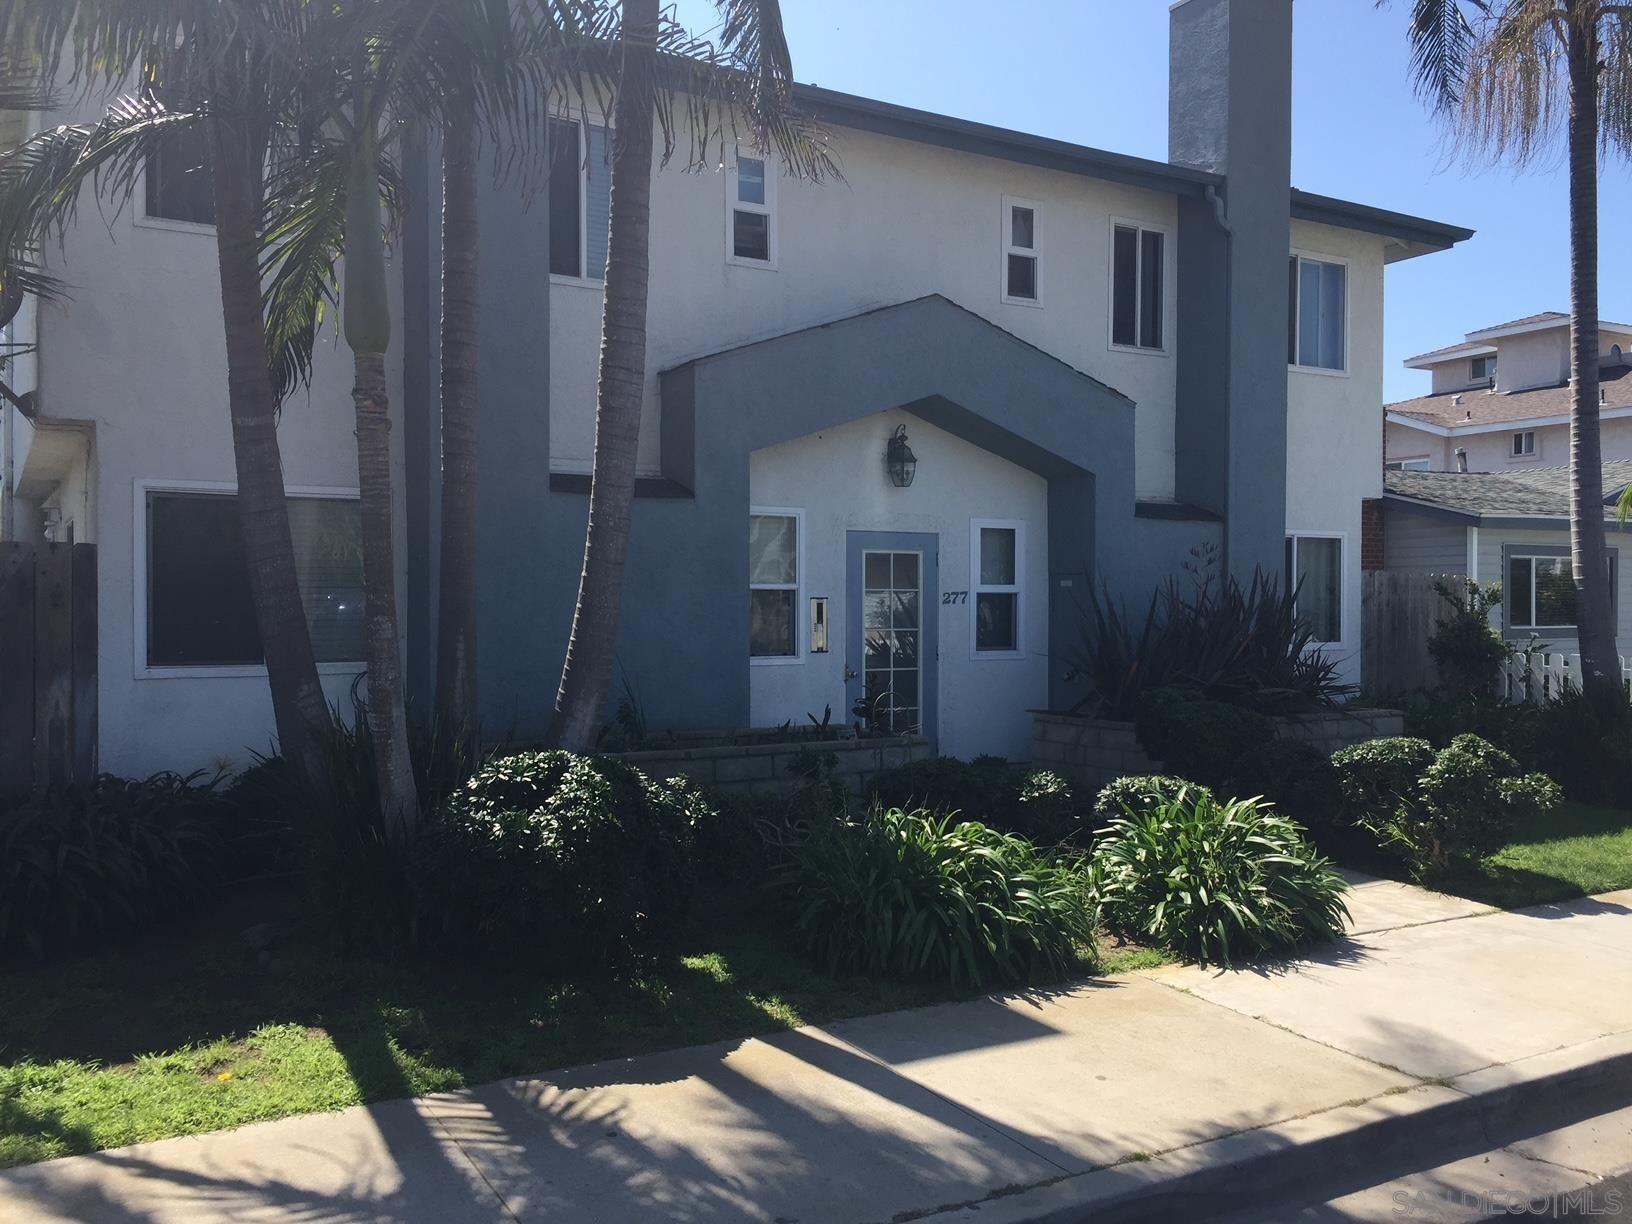 Photo of 277 Elm Avenue #D, Imperial Beach, CA 91932 (MLS # 210013166)